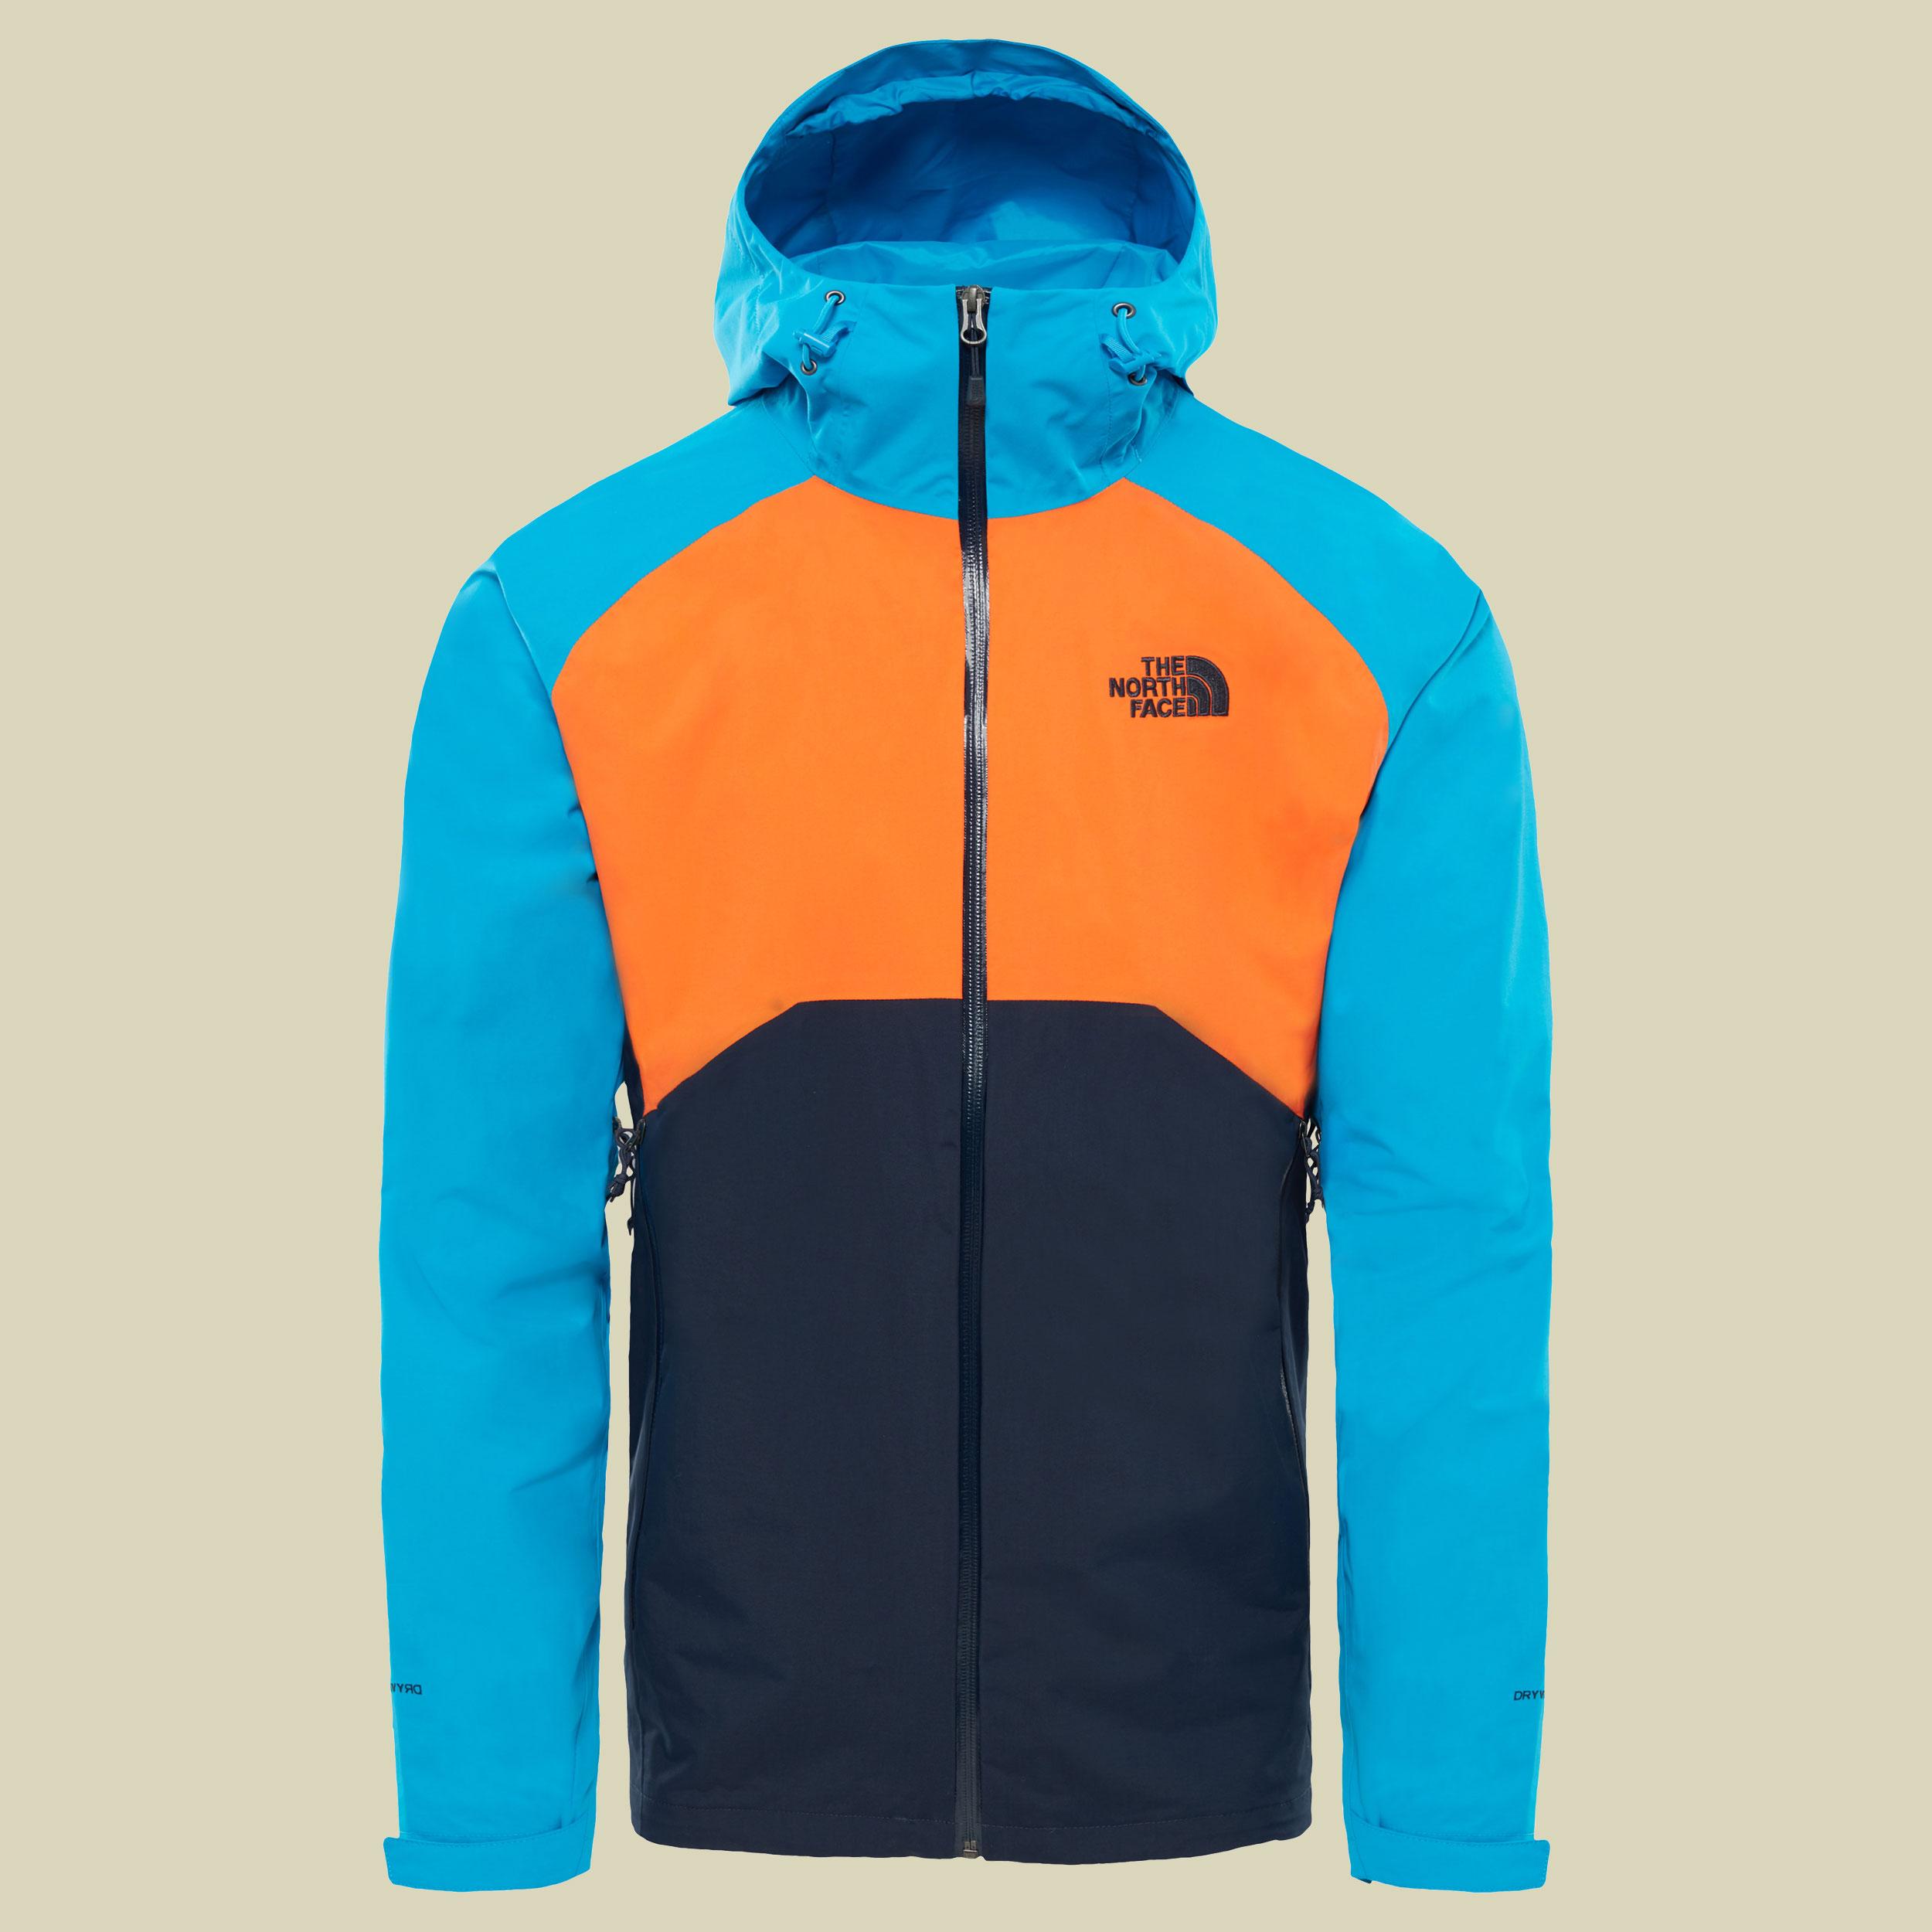 The North Face Stratos Jacket Men Herren Hardshelljacke Größe S urban navy/persian orange/hyper blue